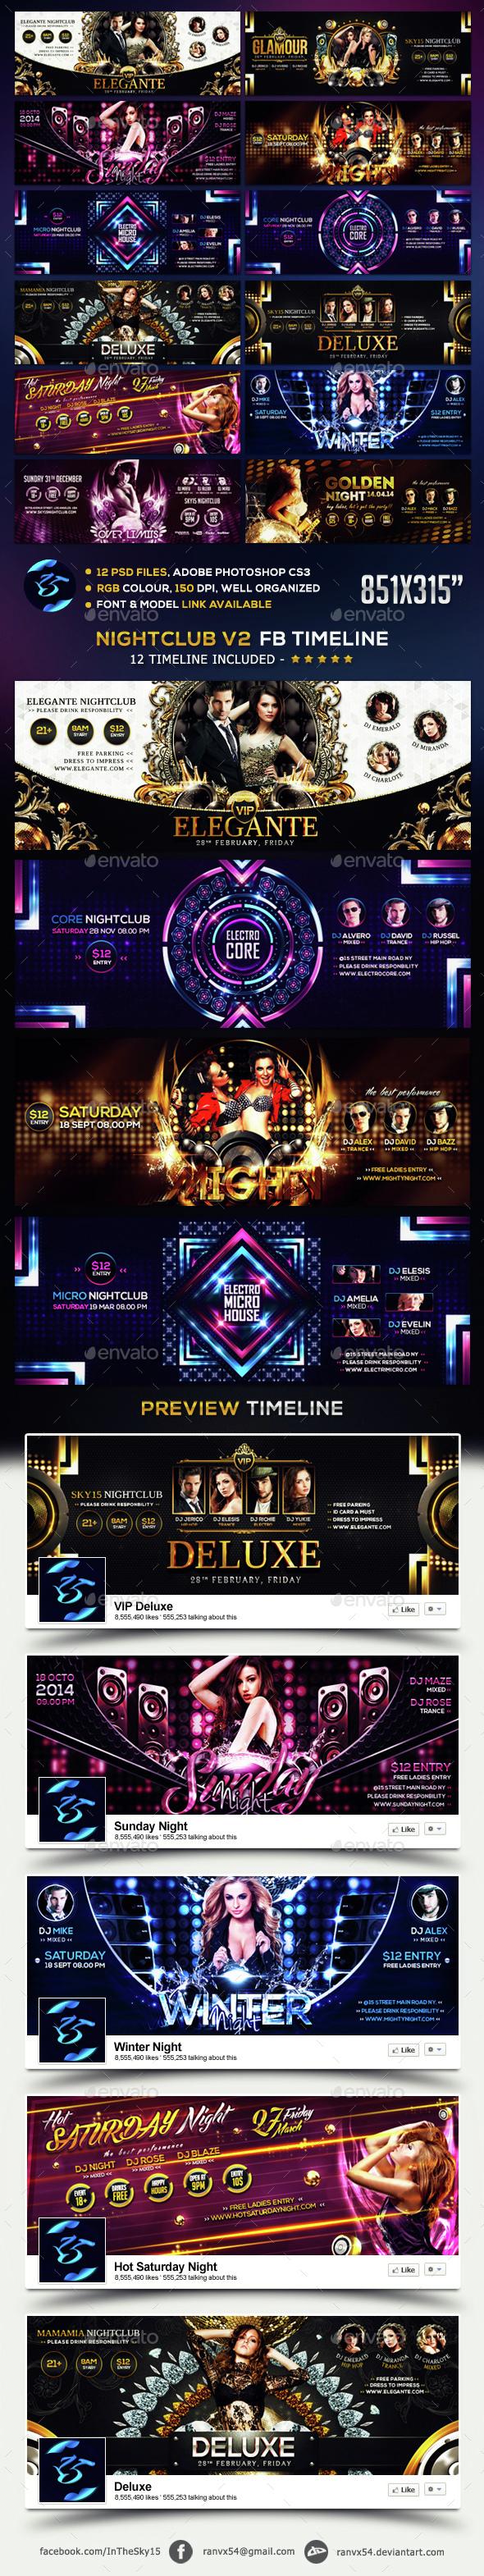 Nightclub V2 FB Timeline Cover